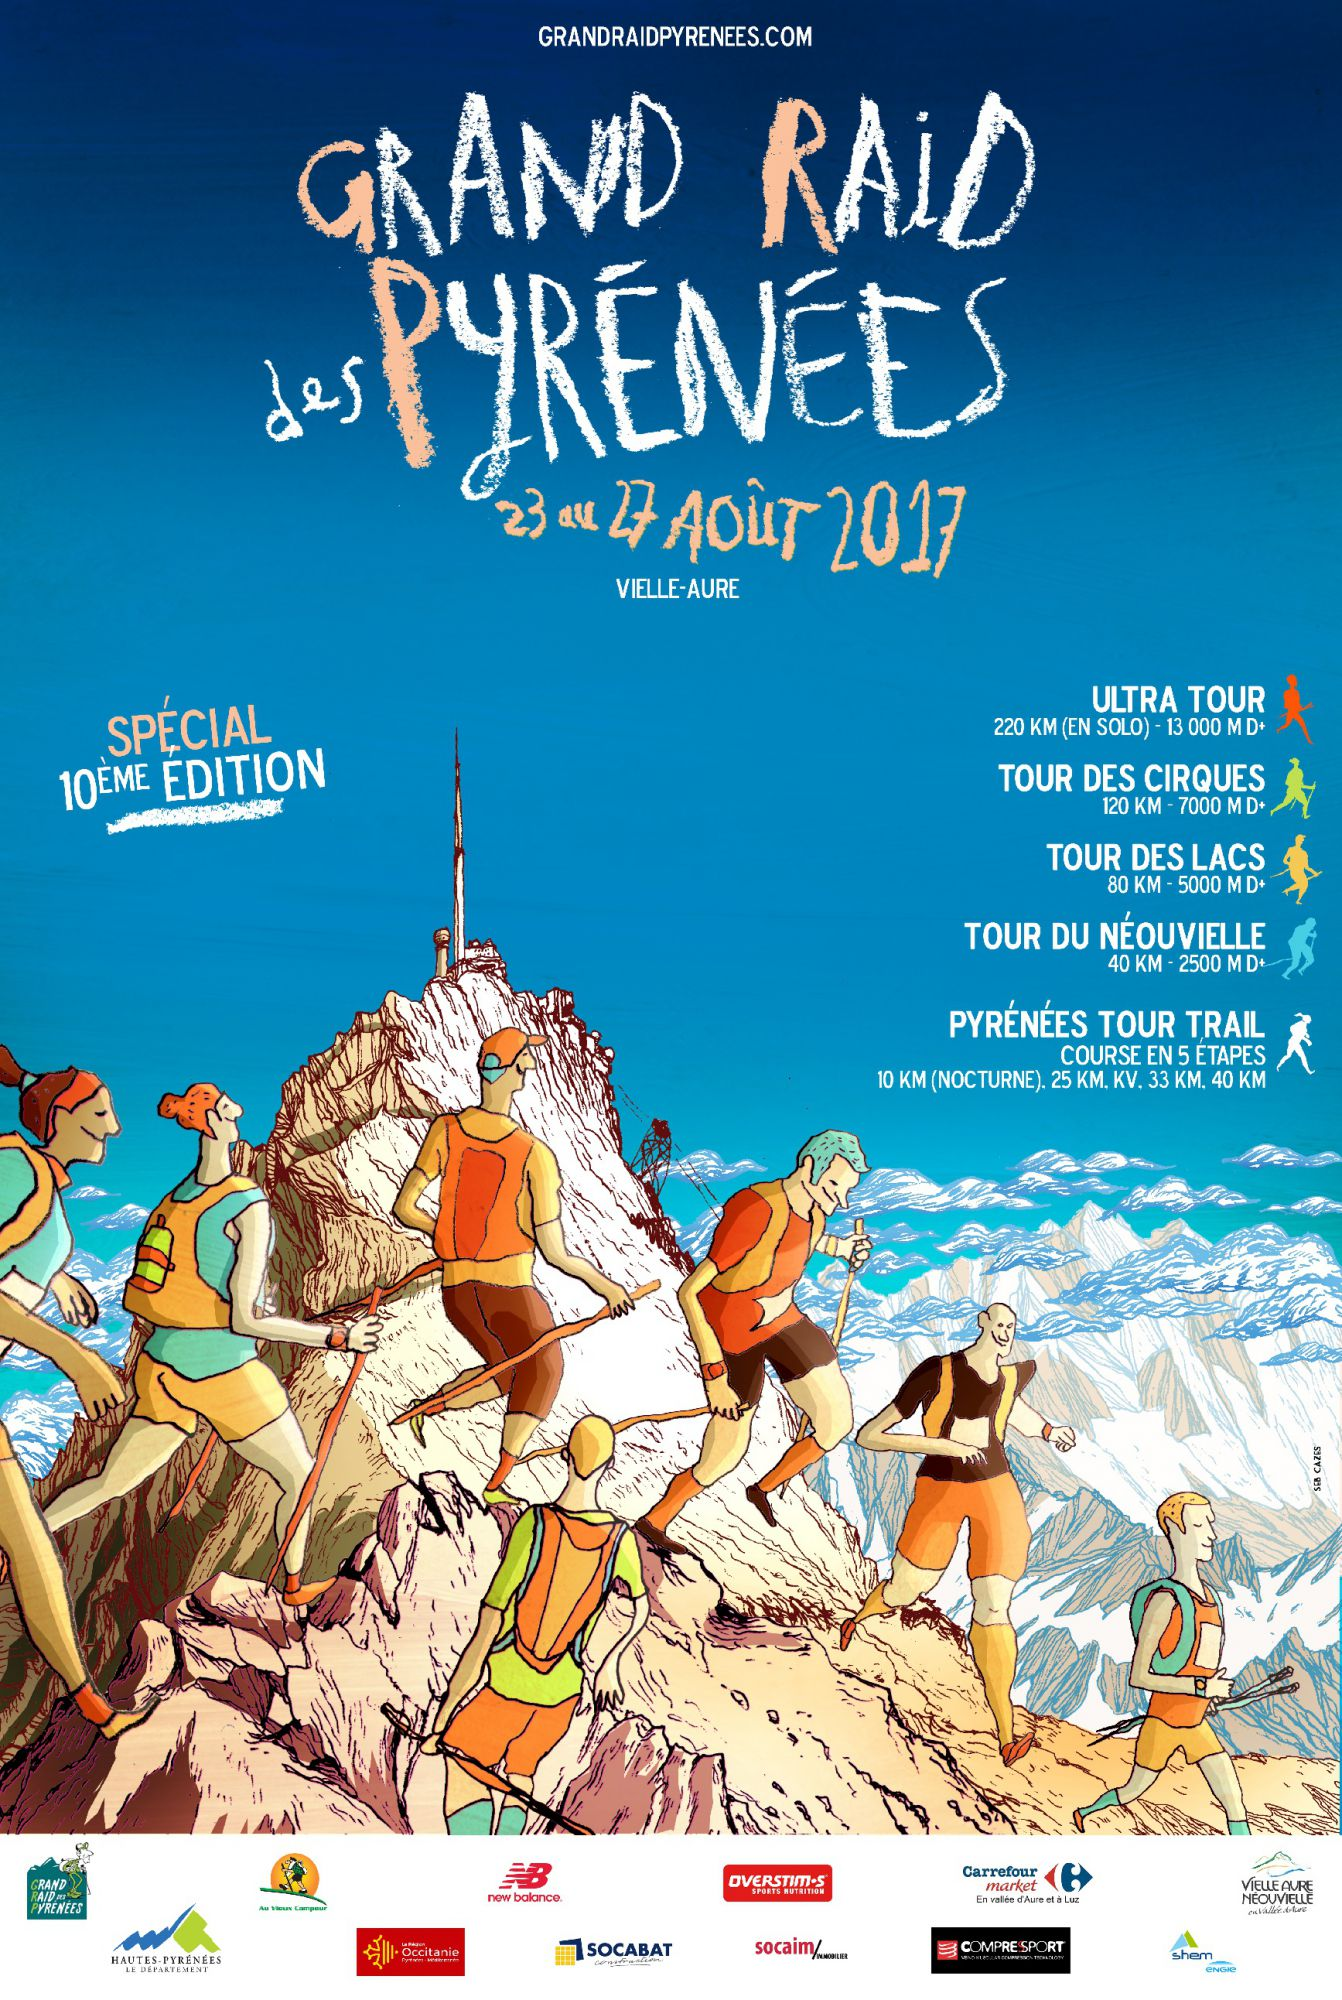 Grand Raid des Pyrénées (GRP)